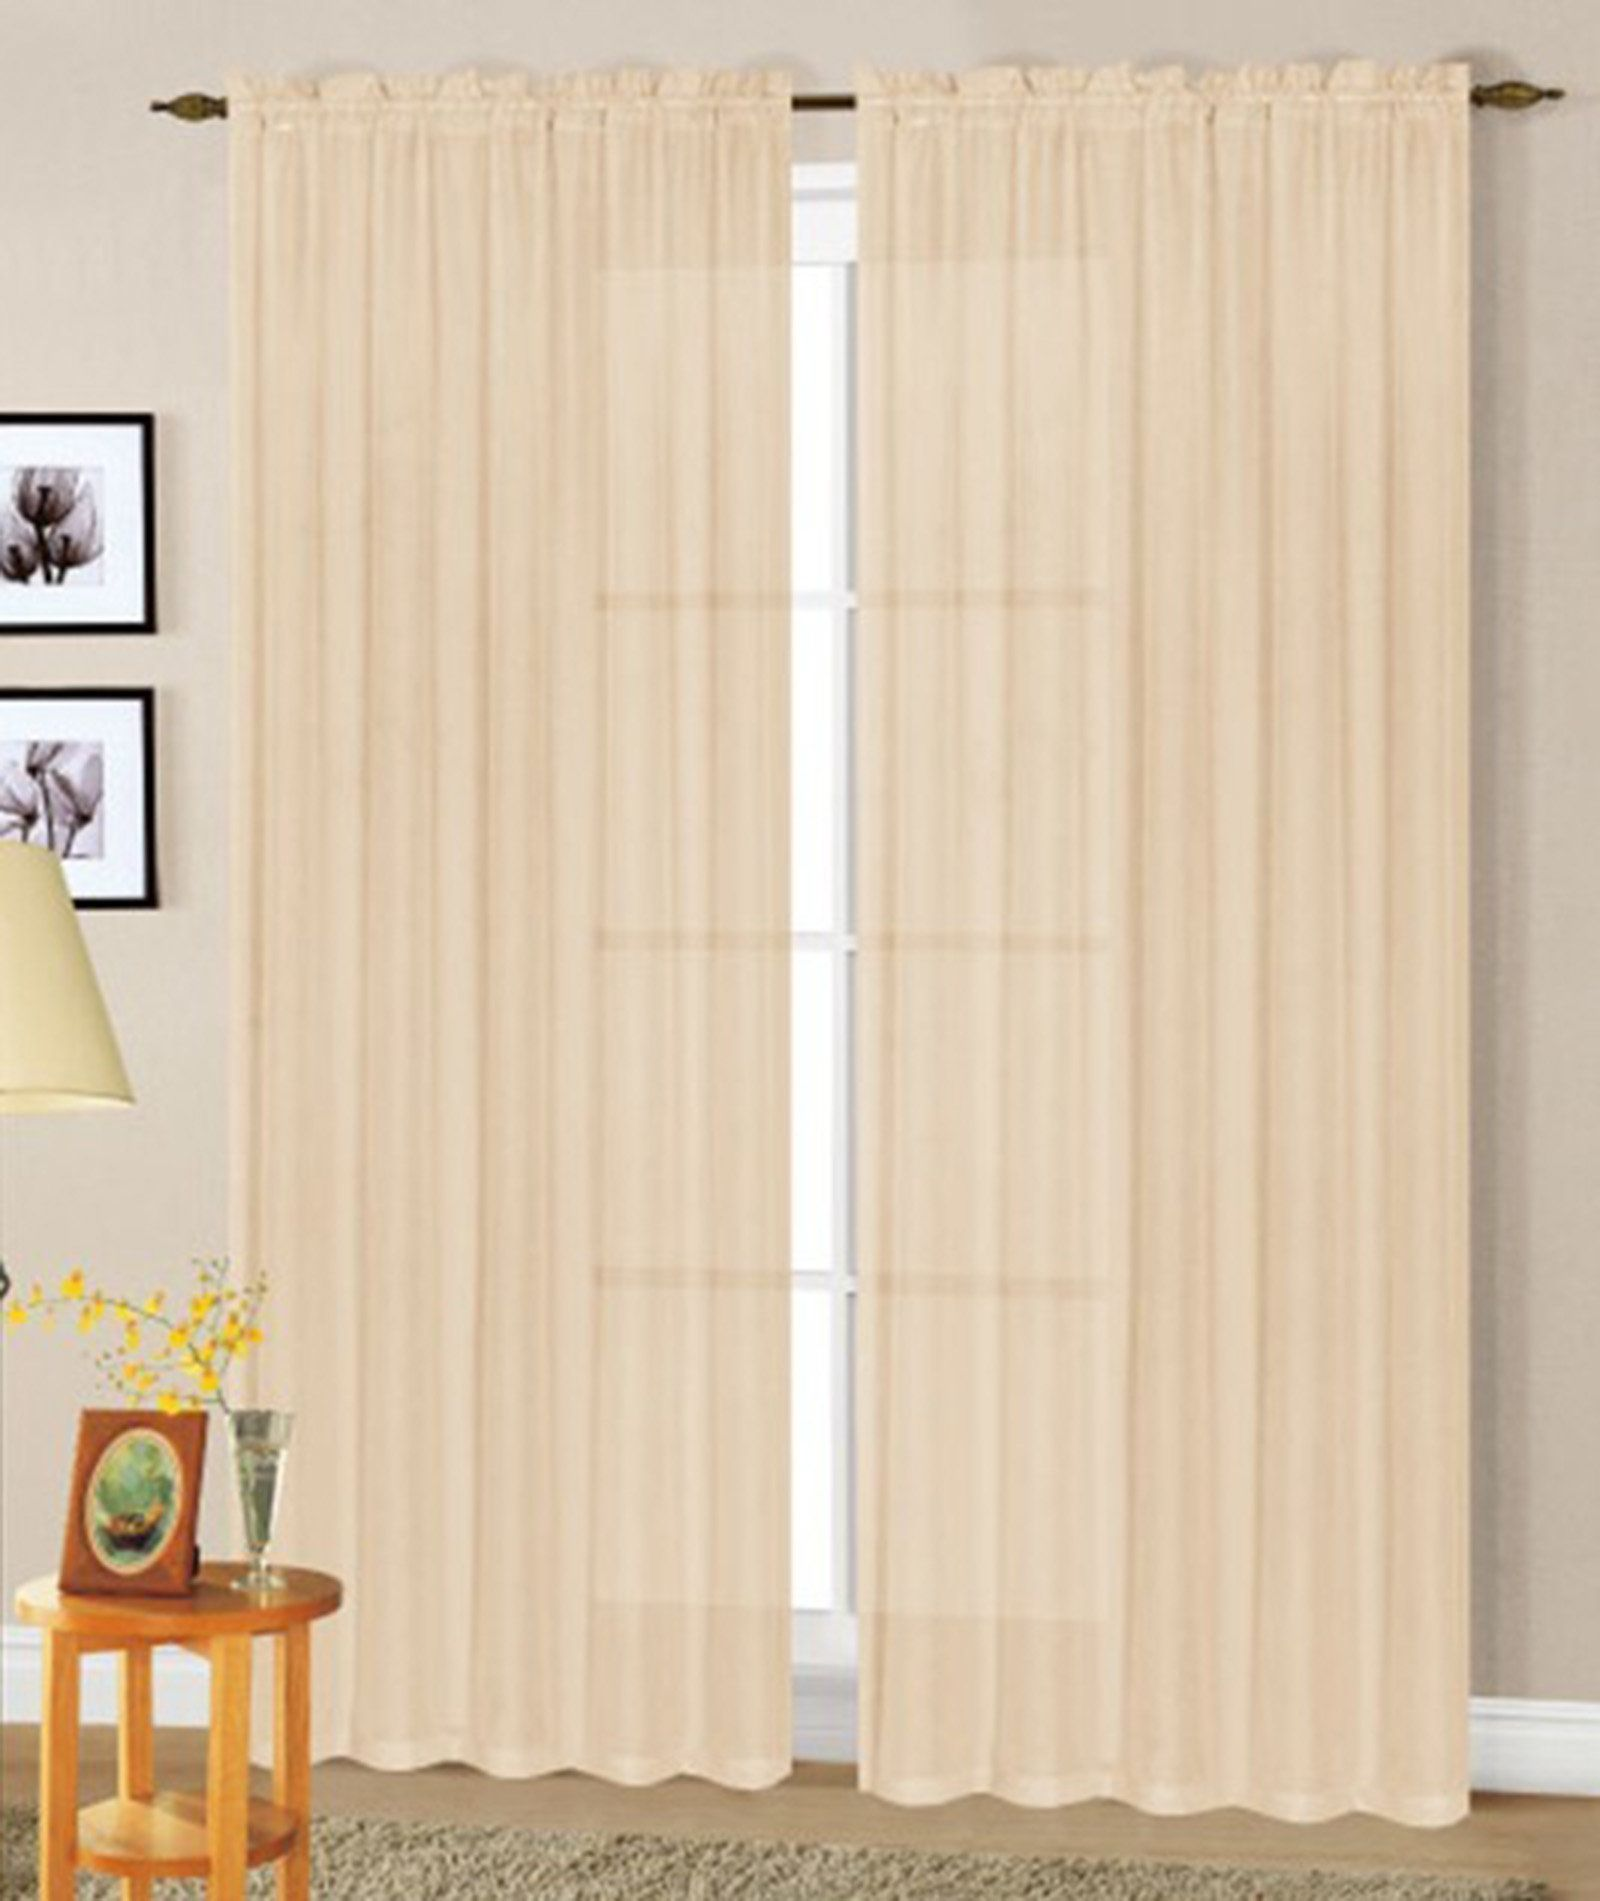 Smithfield luxurious solid sheer rod pocket curtain panels